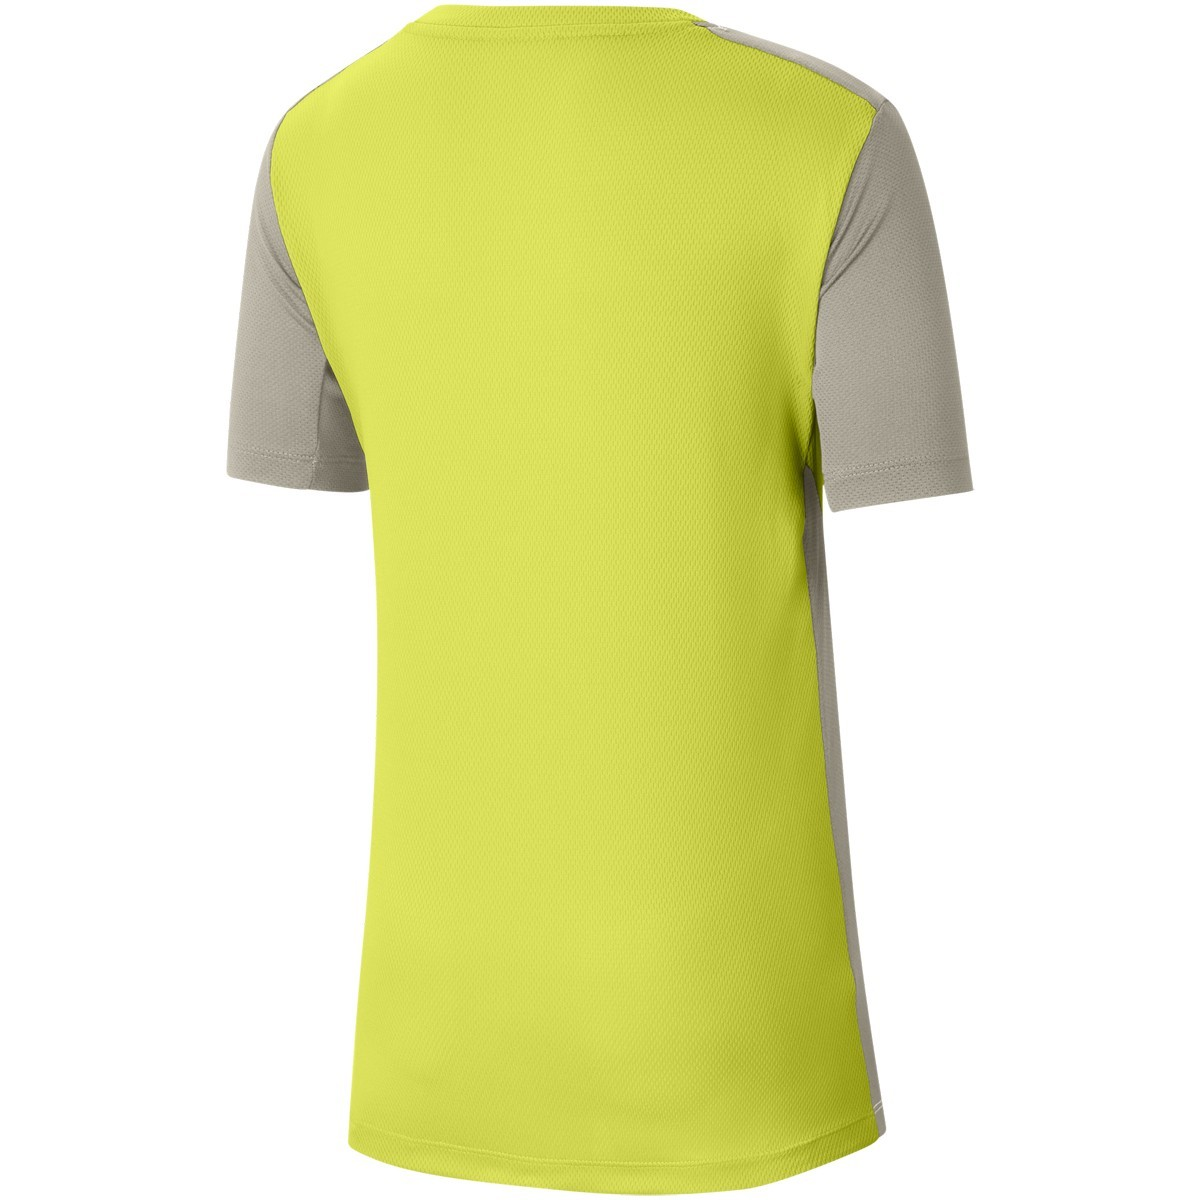 Теннисная футболка детская Nike Instacool Sleeve Training Top volt/stone